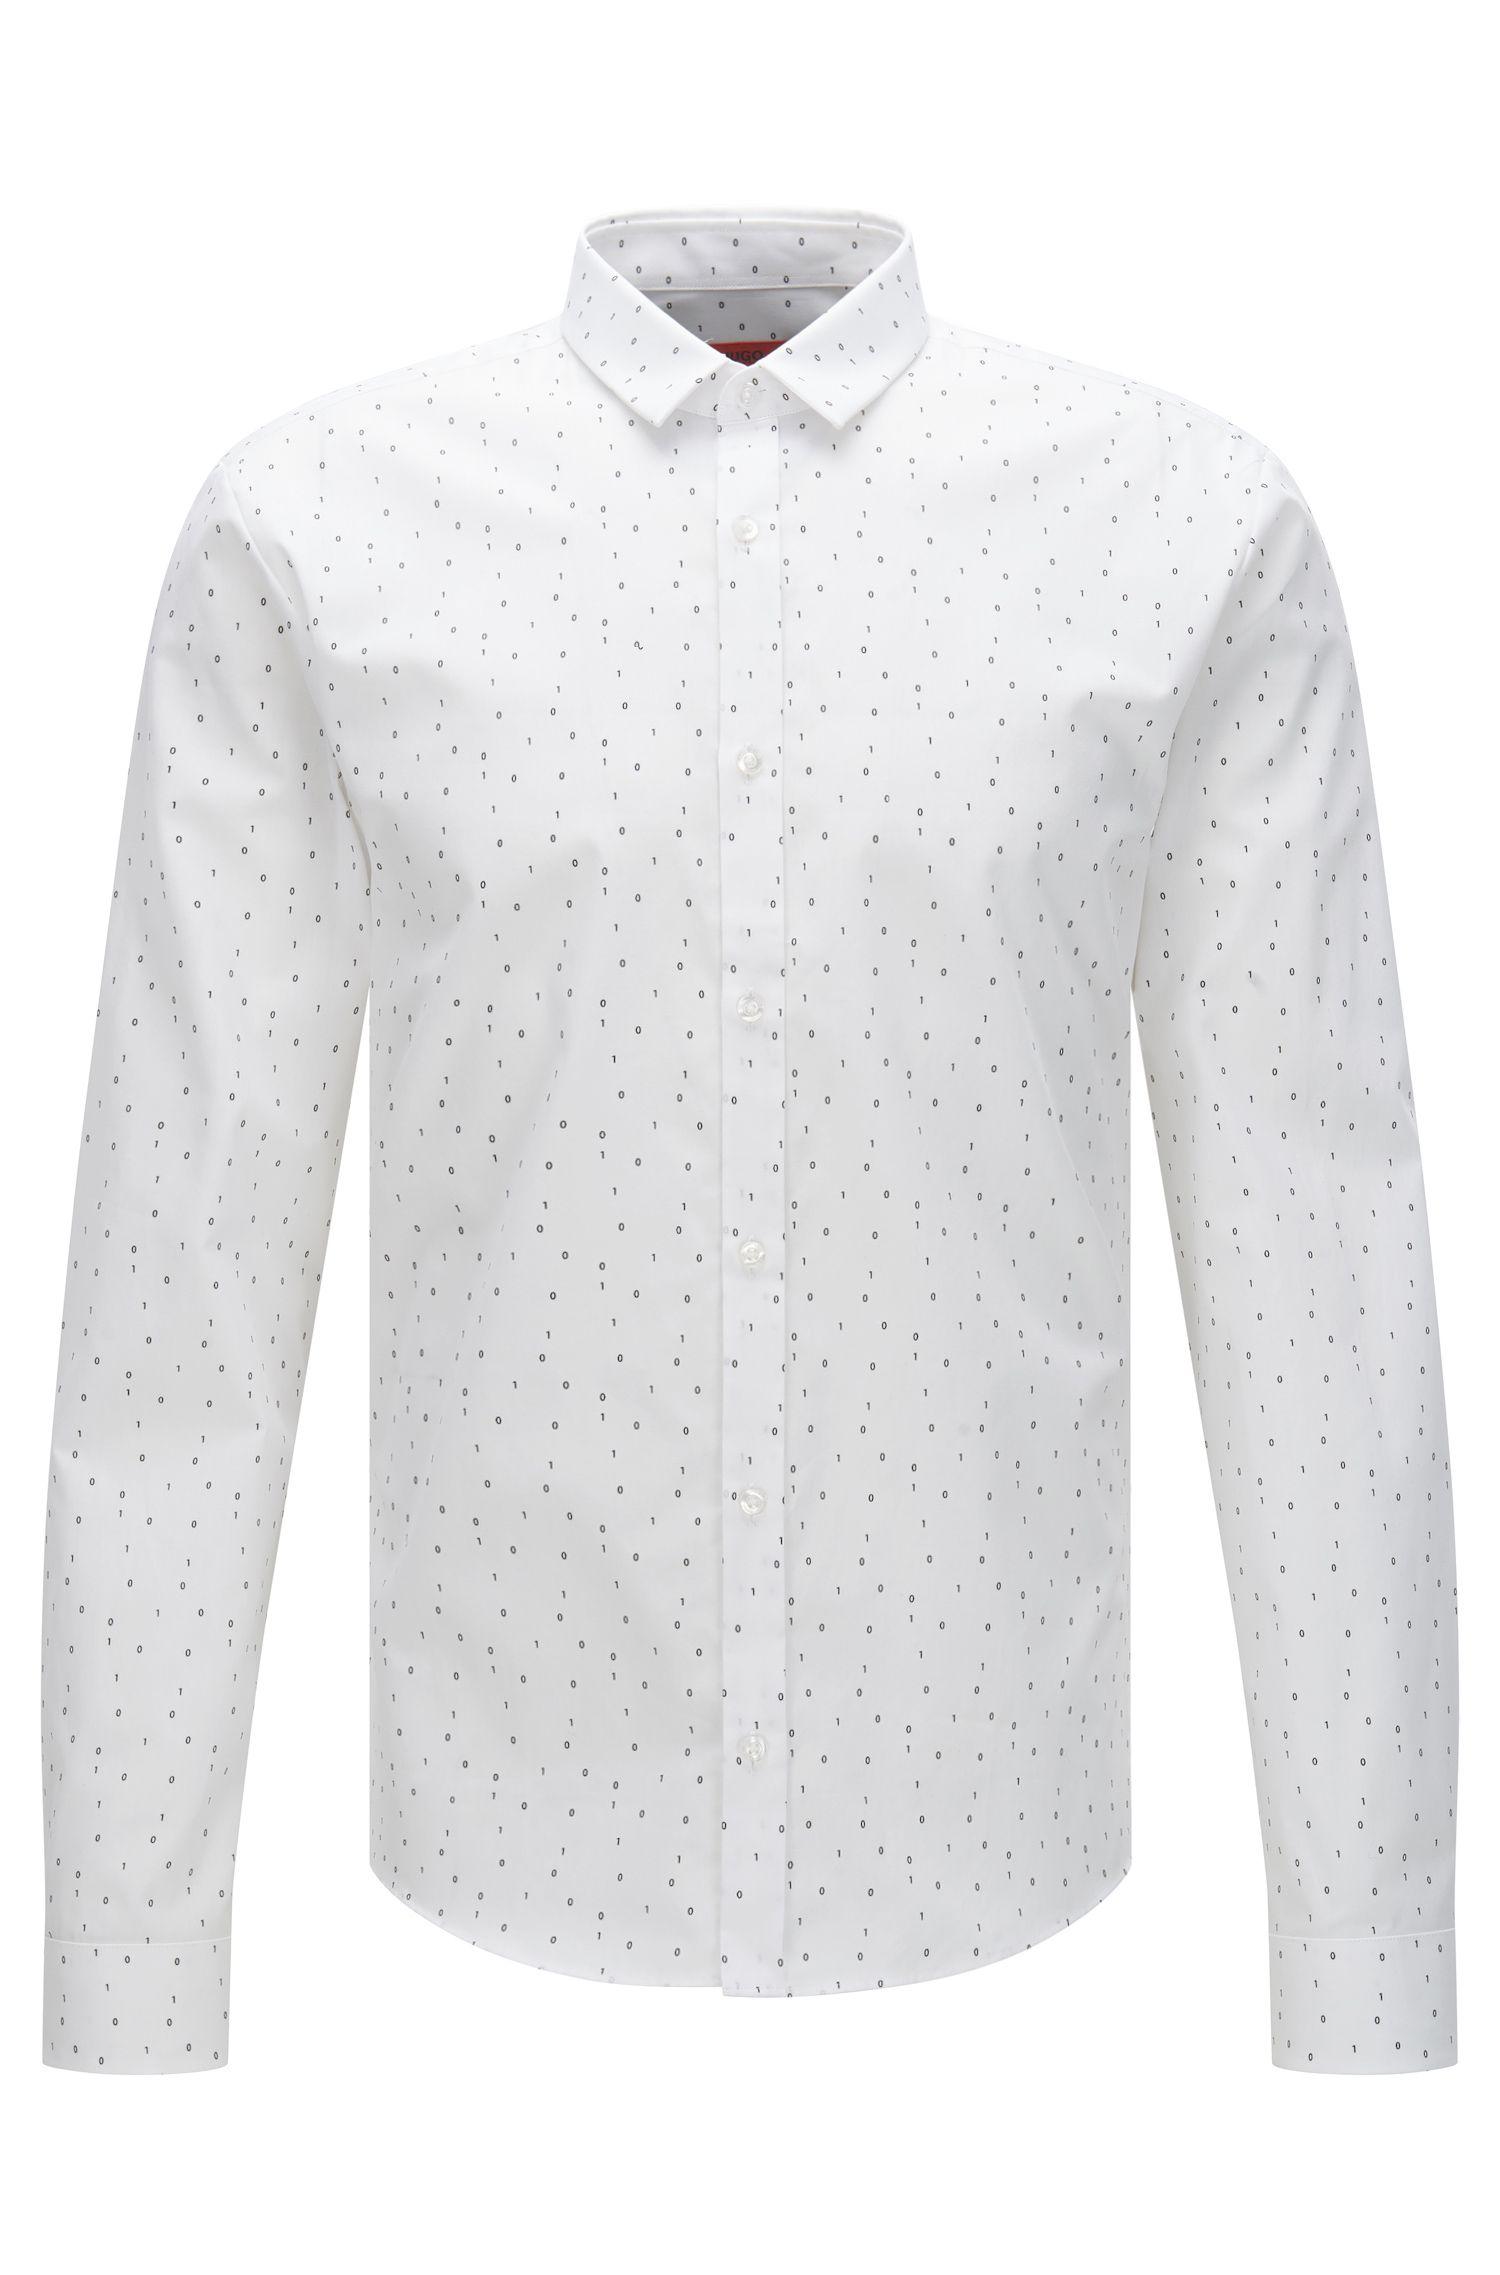 Gemustertes Extra Slim-Fit Hemd aus Baumwolle: 'Ero3'